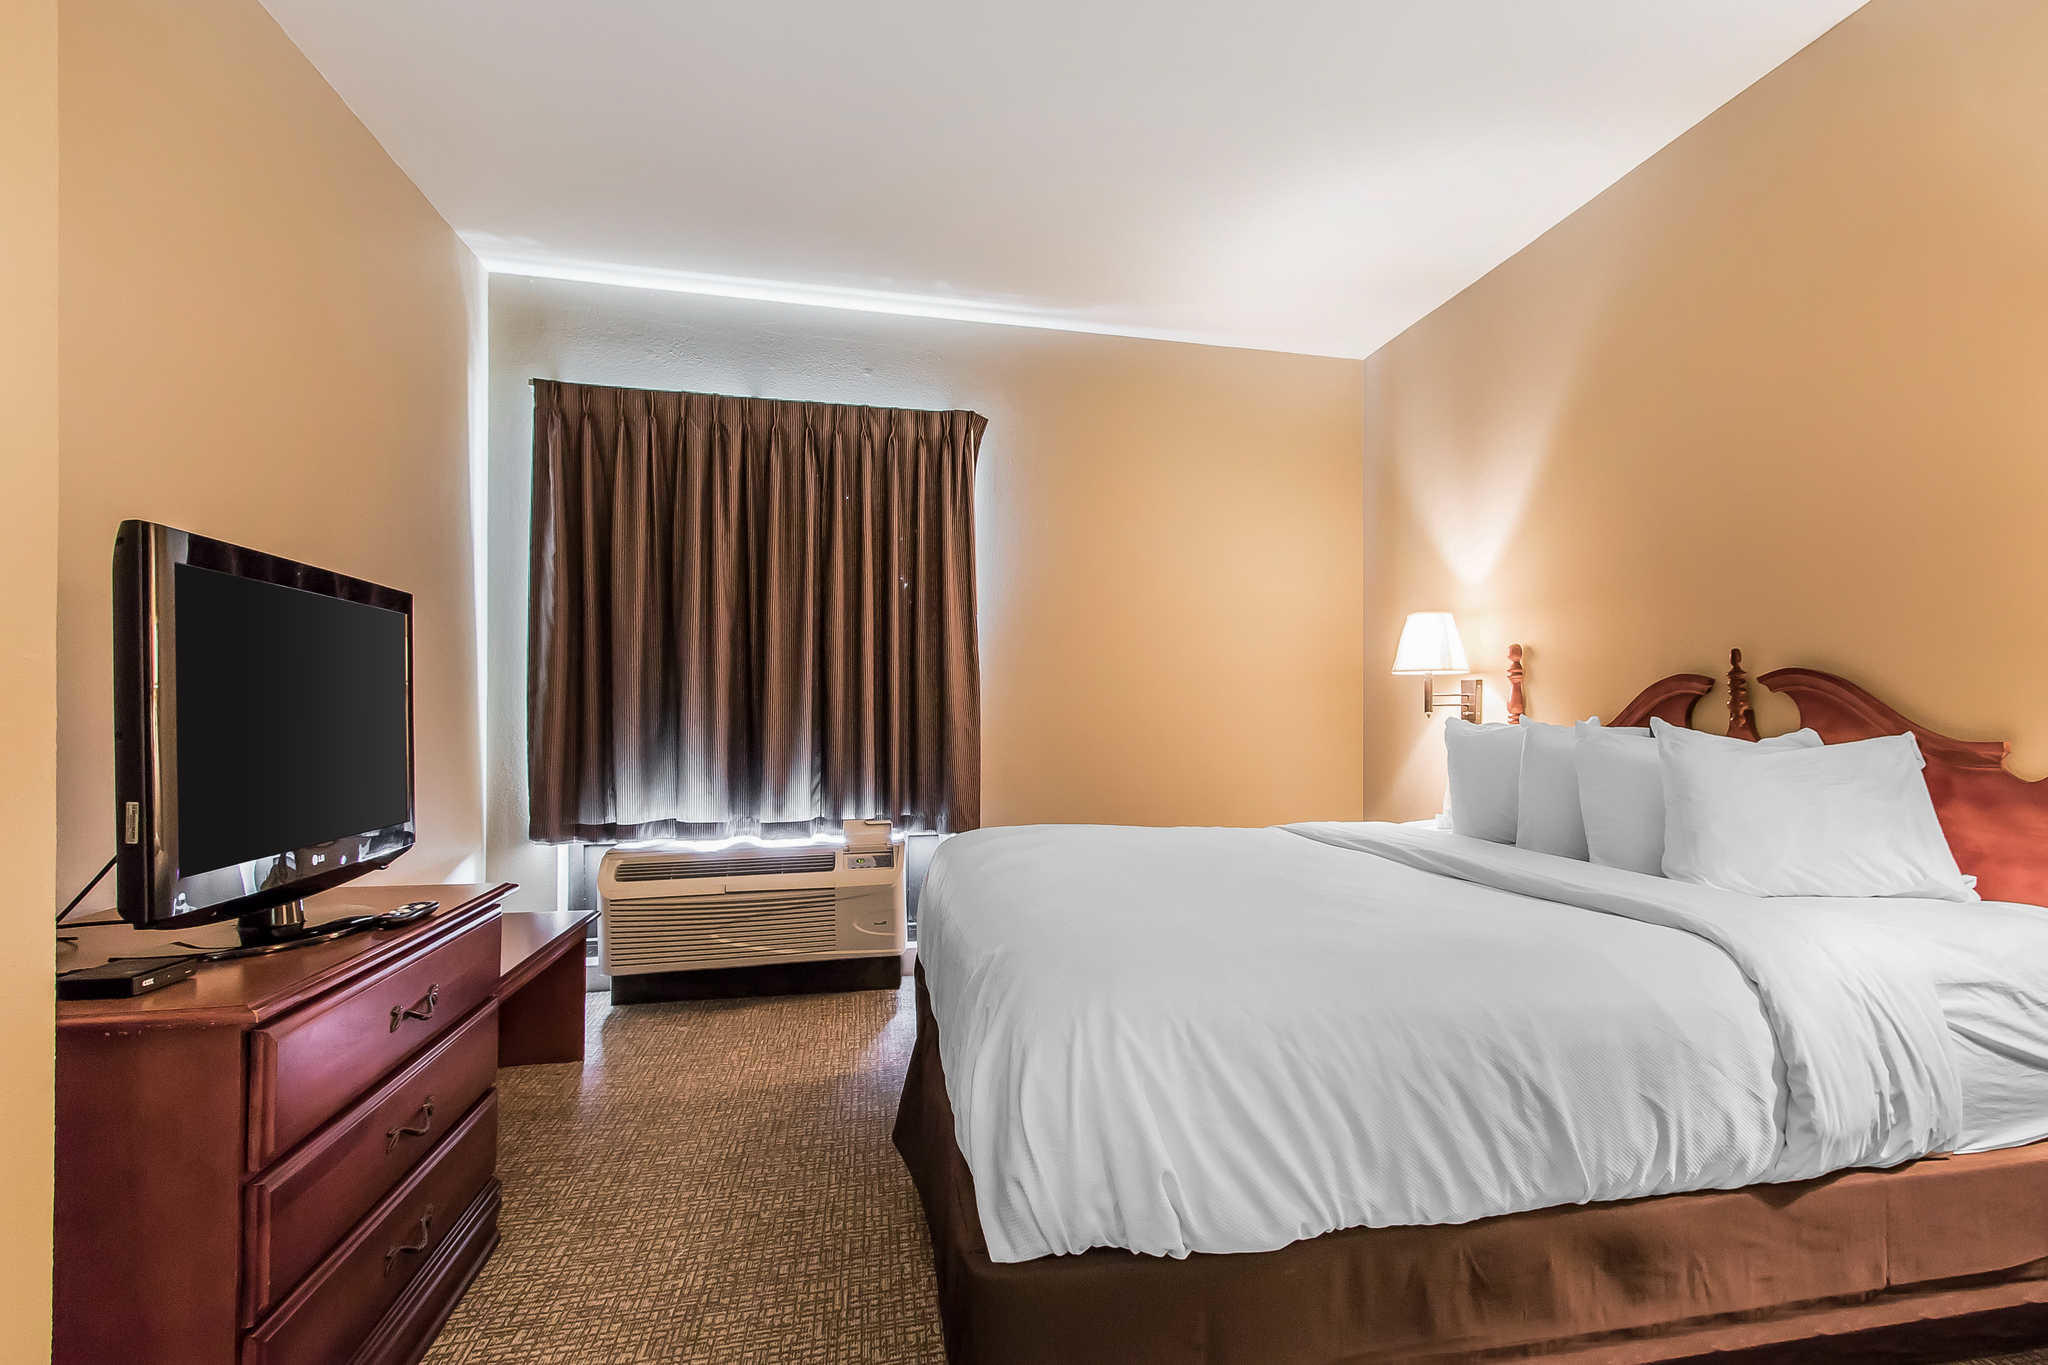 Quality Suites image 21